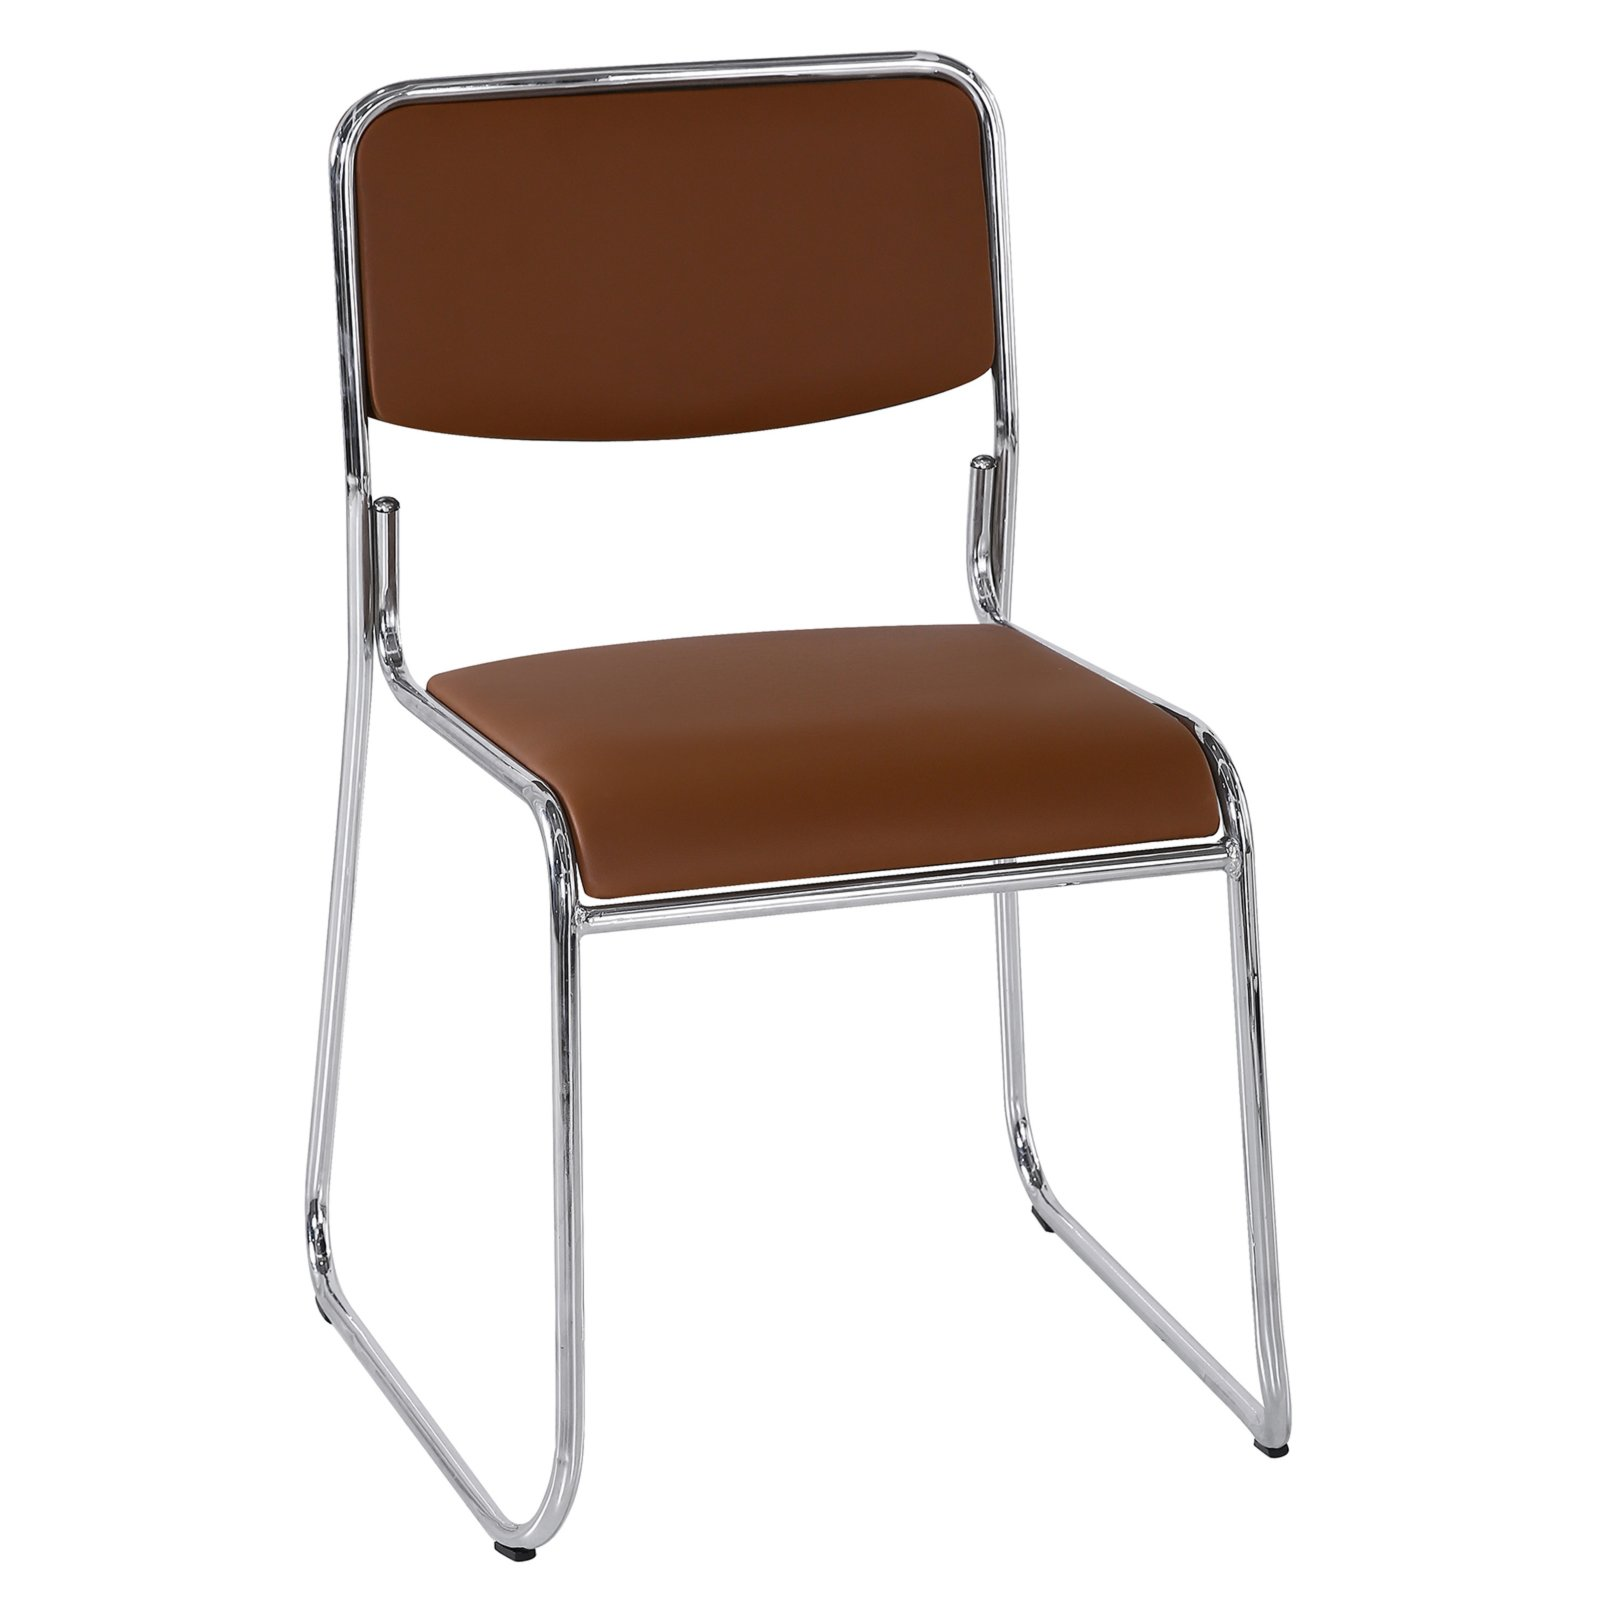 Stuhl saturn braun kunstleder polsterst hle st hle for Kunstleder stuhl braun